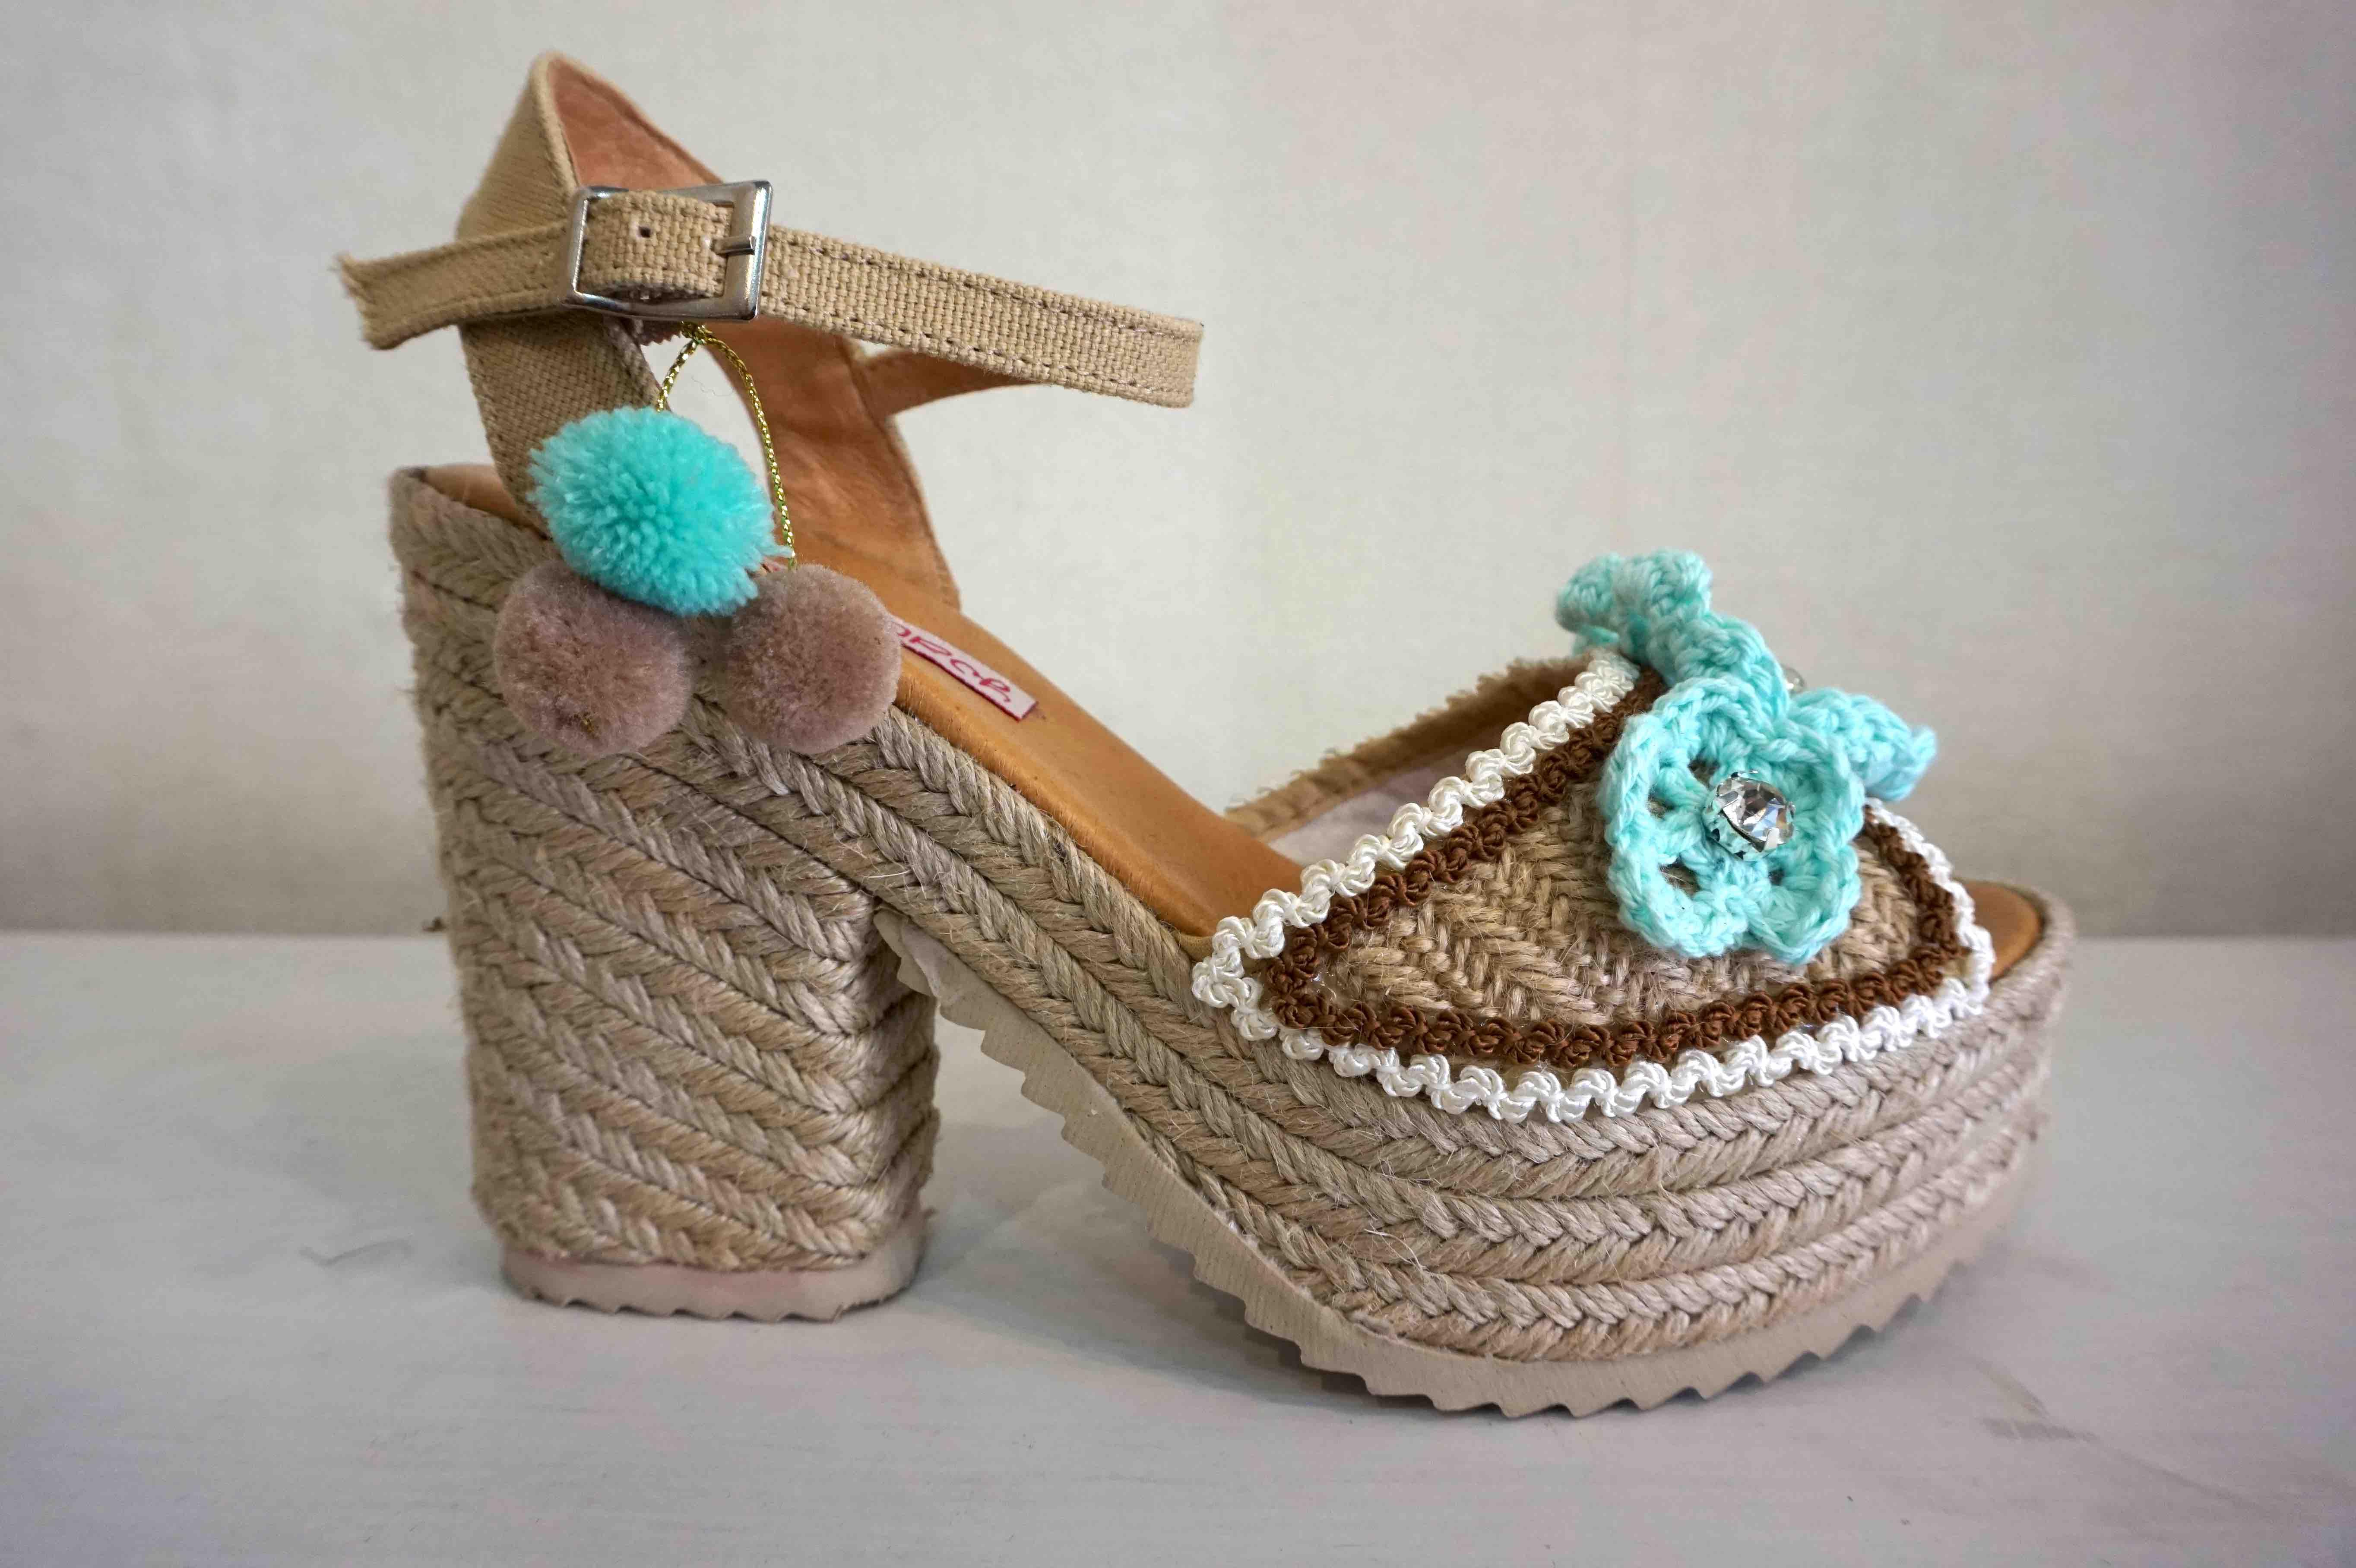 – TrendyTienda Sandalias Pompones Y Guarch Lola Crochet Ibiza qSpGzMVU